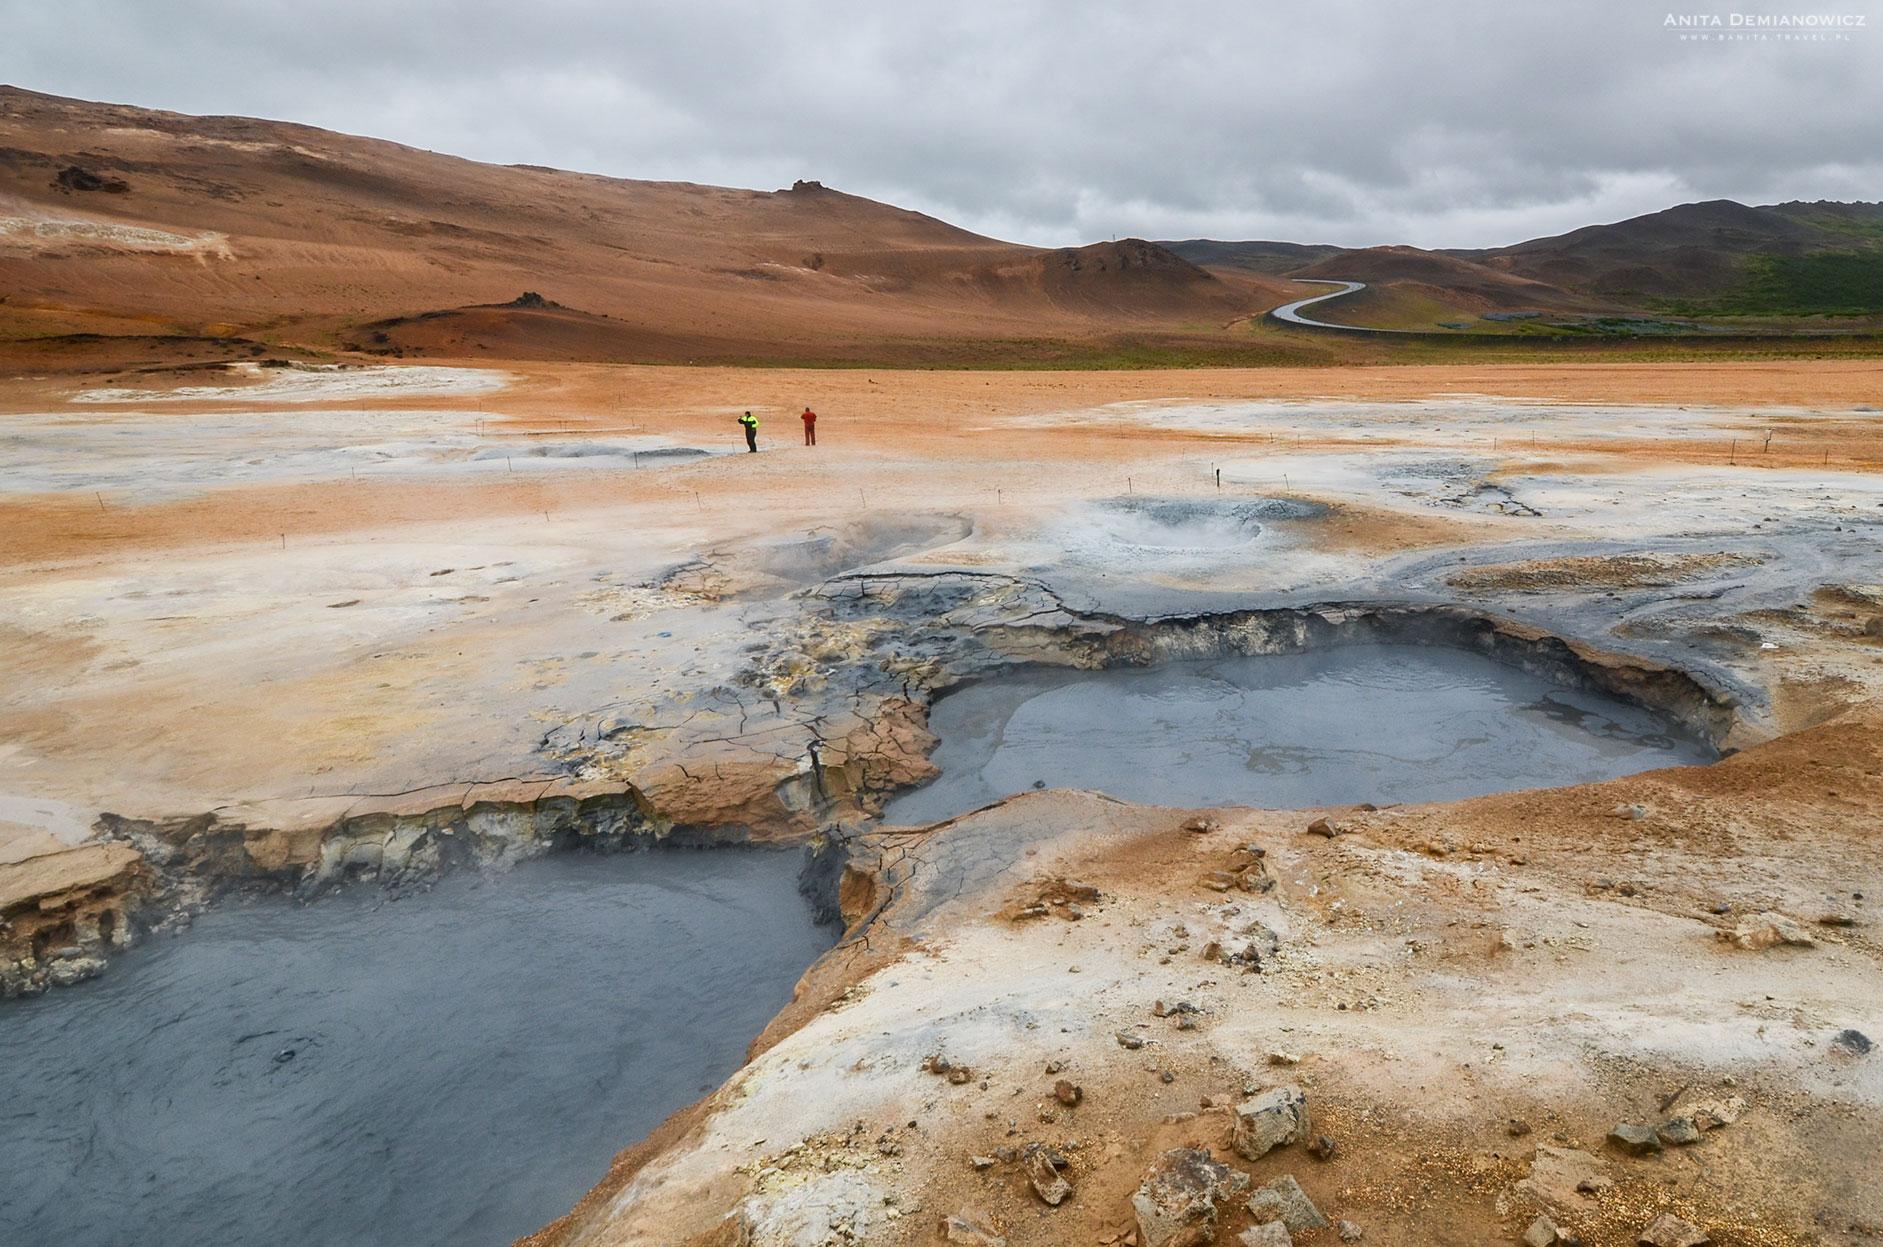 Namafjall, Islandia, Anita Demianowicz